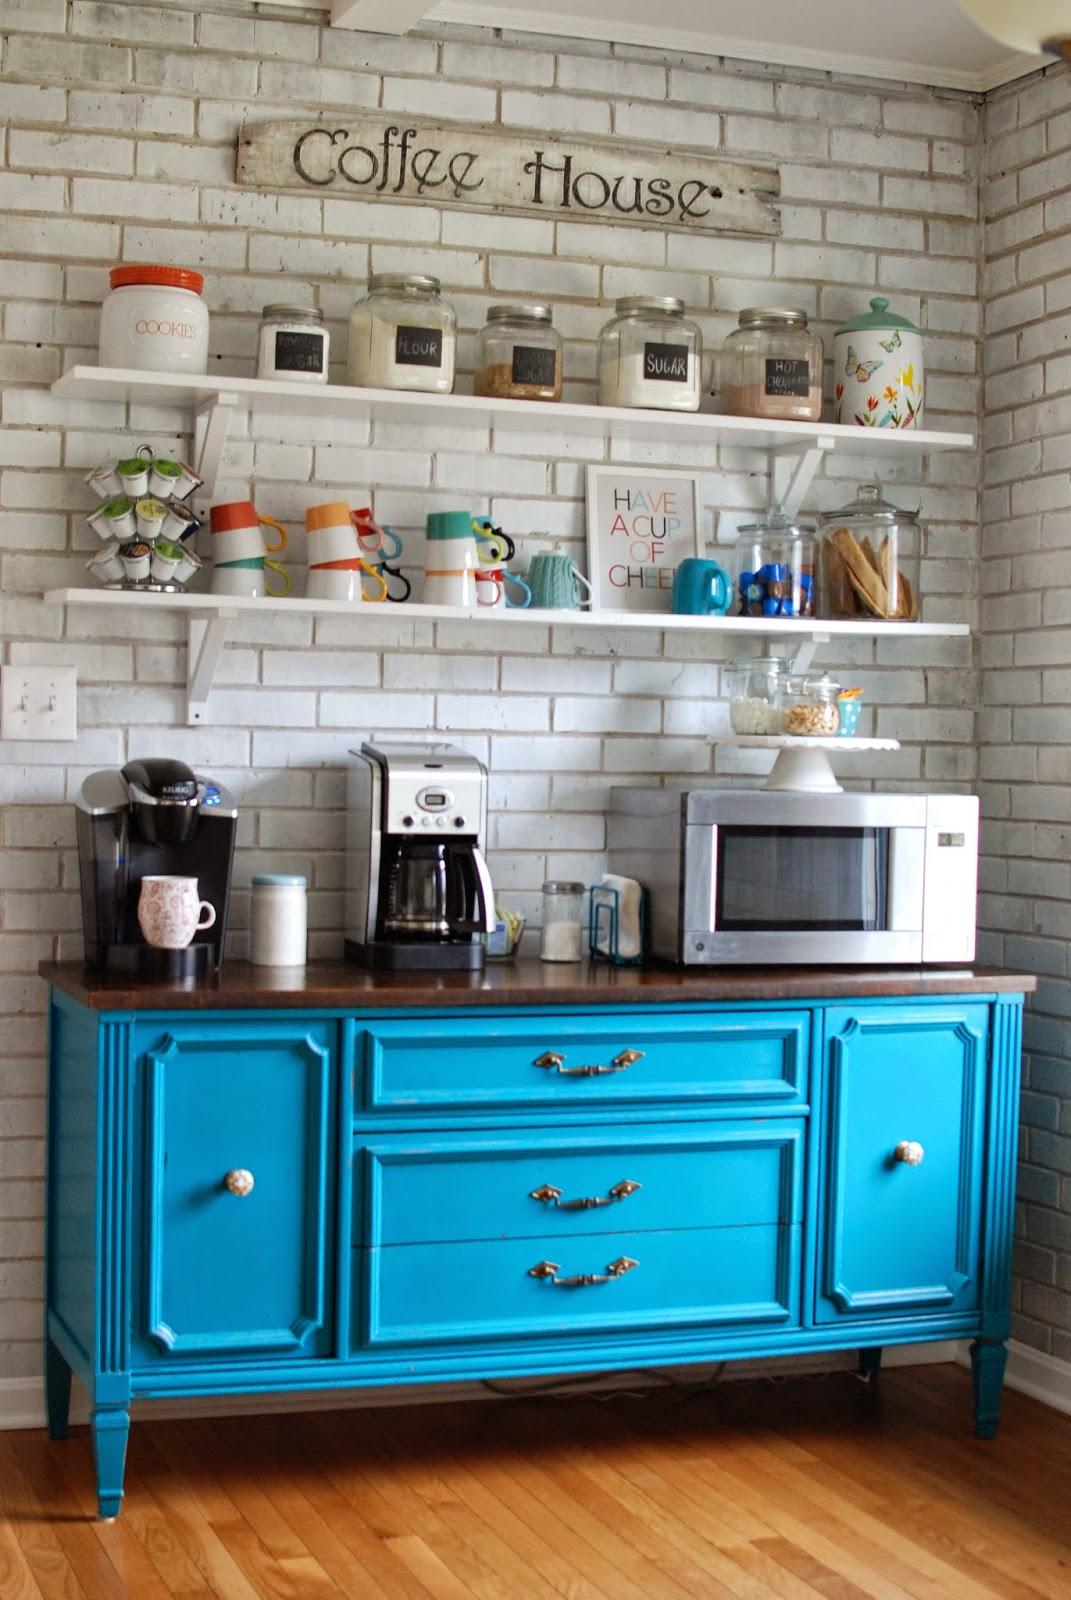 Coffee Bar Kitchen: Caught In Grace: Kitchen Buffet / Coffee Bar